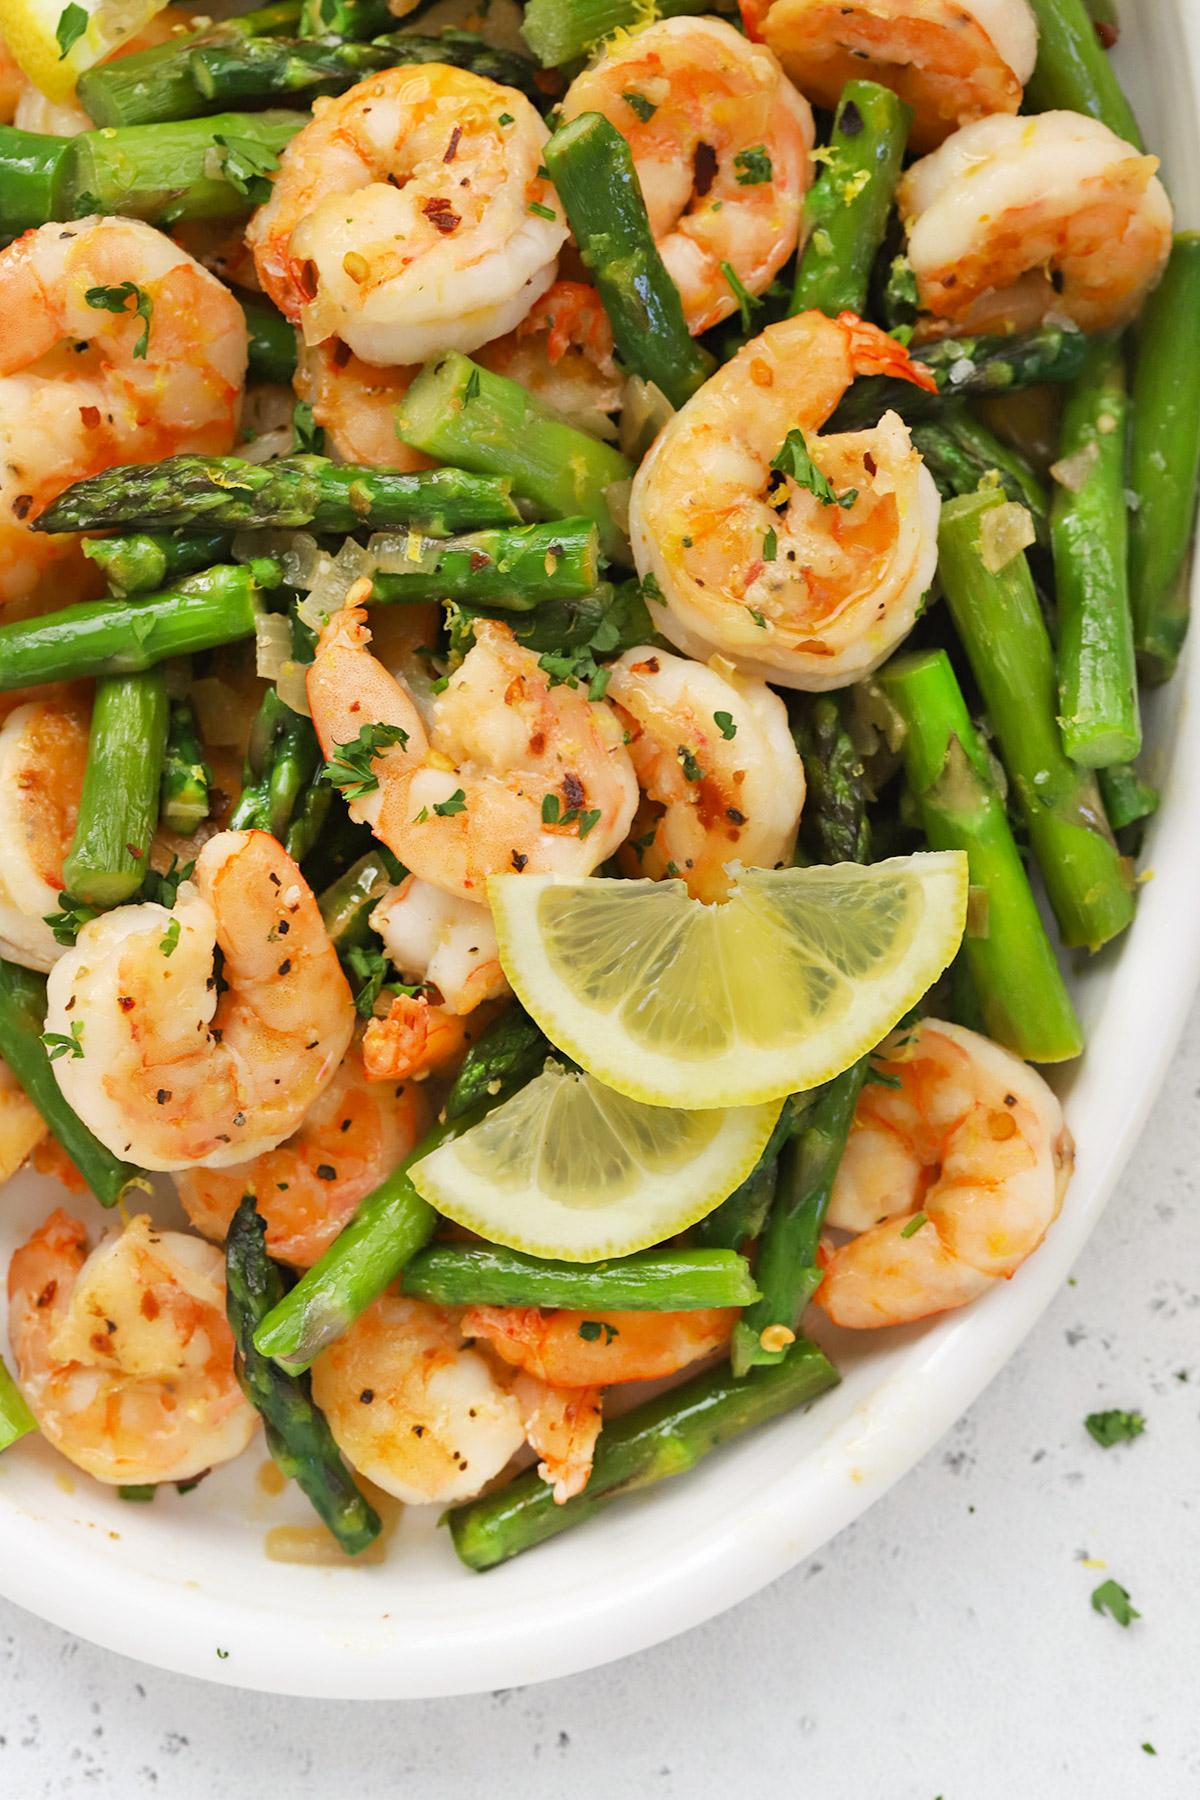 Close up overhead view of a platter of lemon shrimp and asparagus